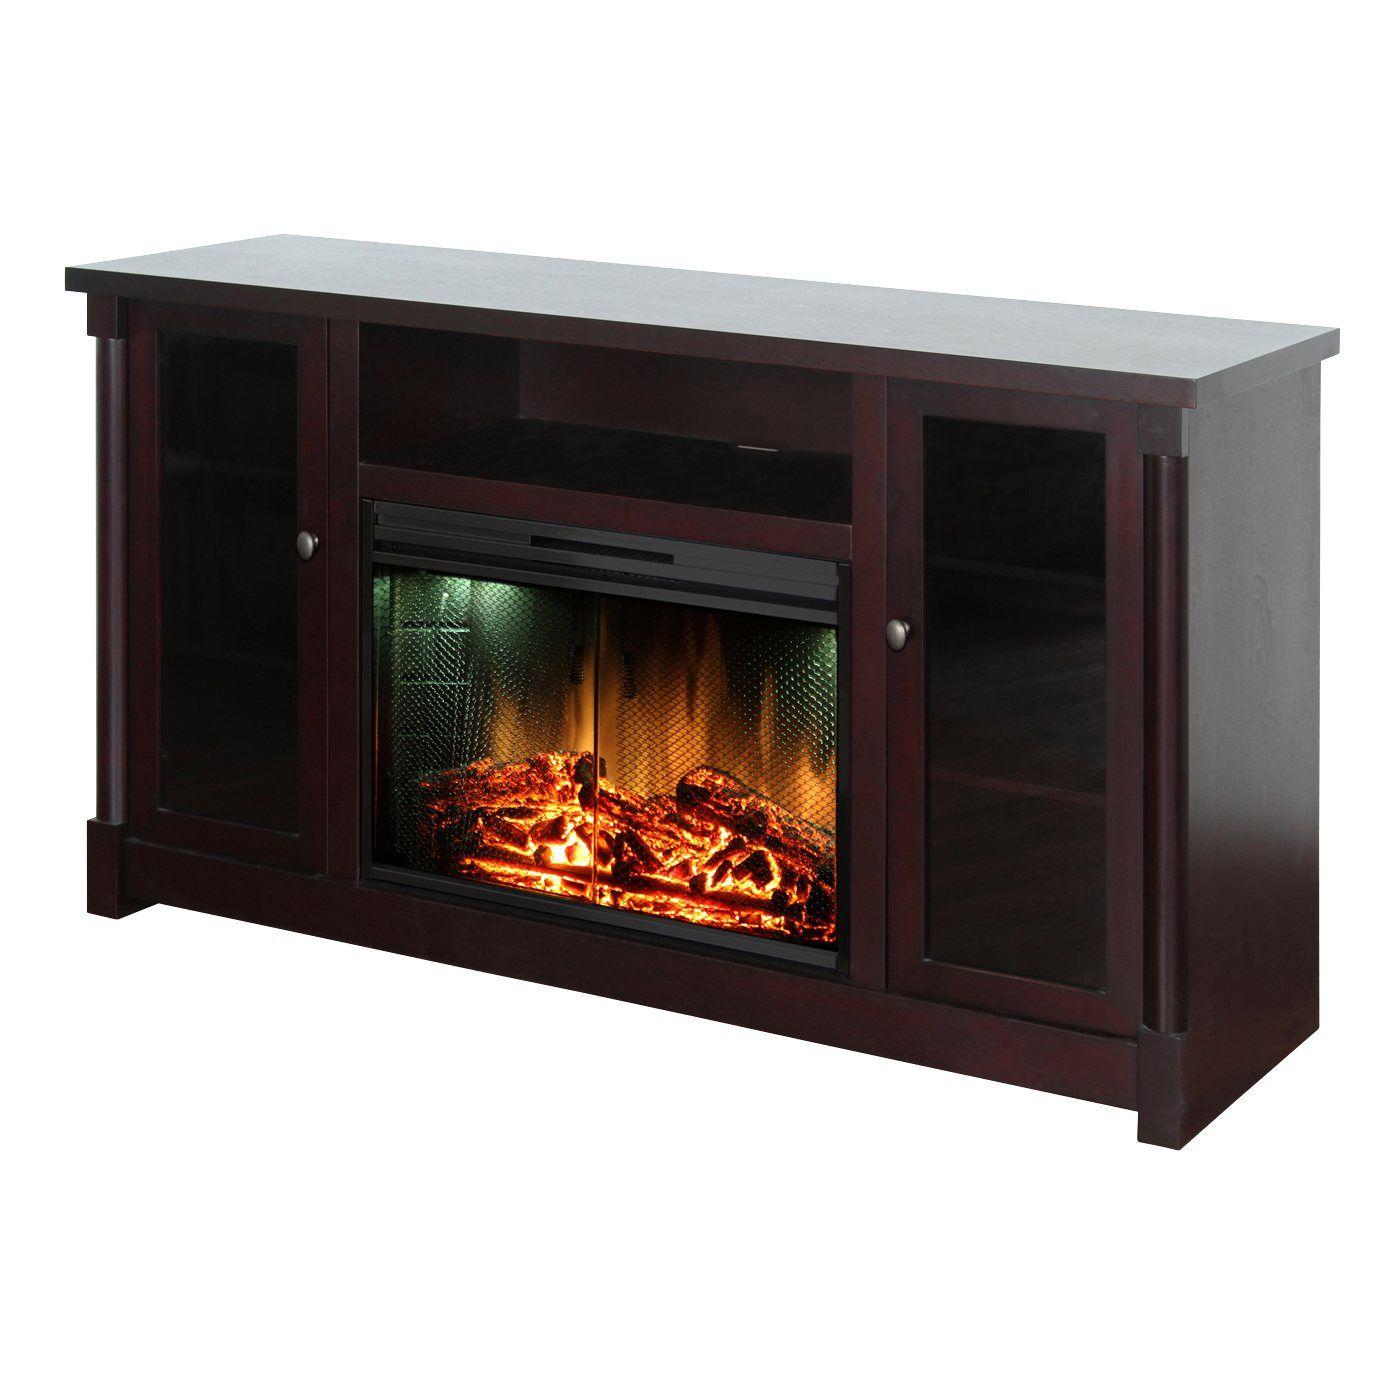 Muskoka Mtvs2520sdc Coventry Tv Stand Electric Fireplace Corner Fireplace Tv Stand Fireplace Tv Stand Electric Fireplace Tv Stand